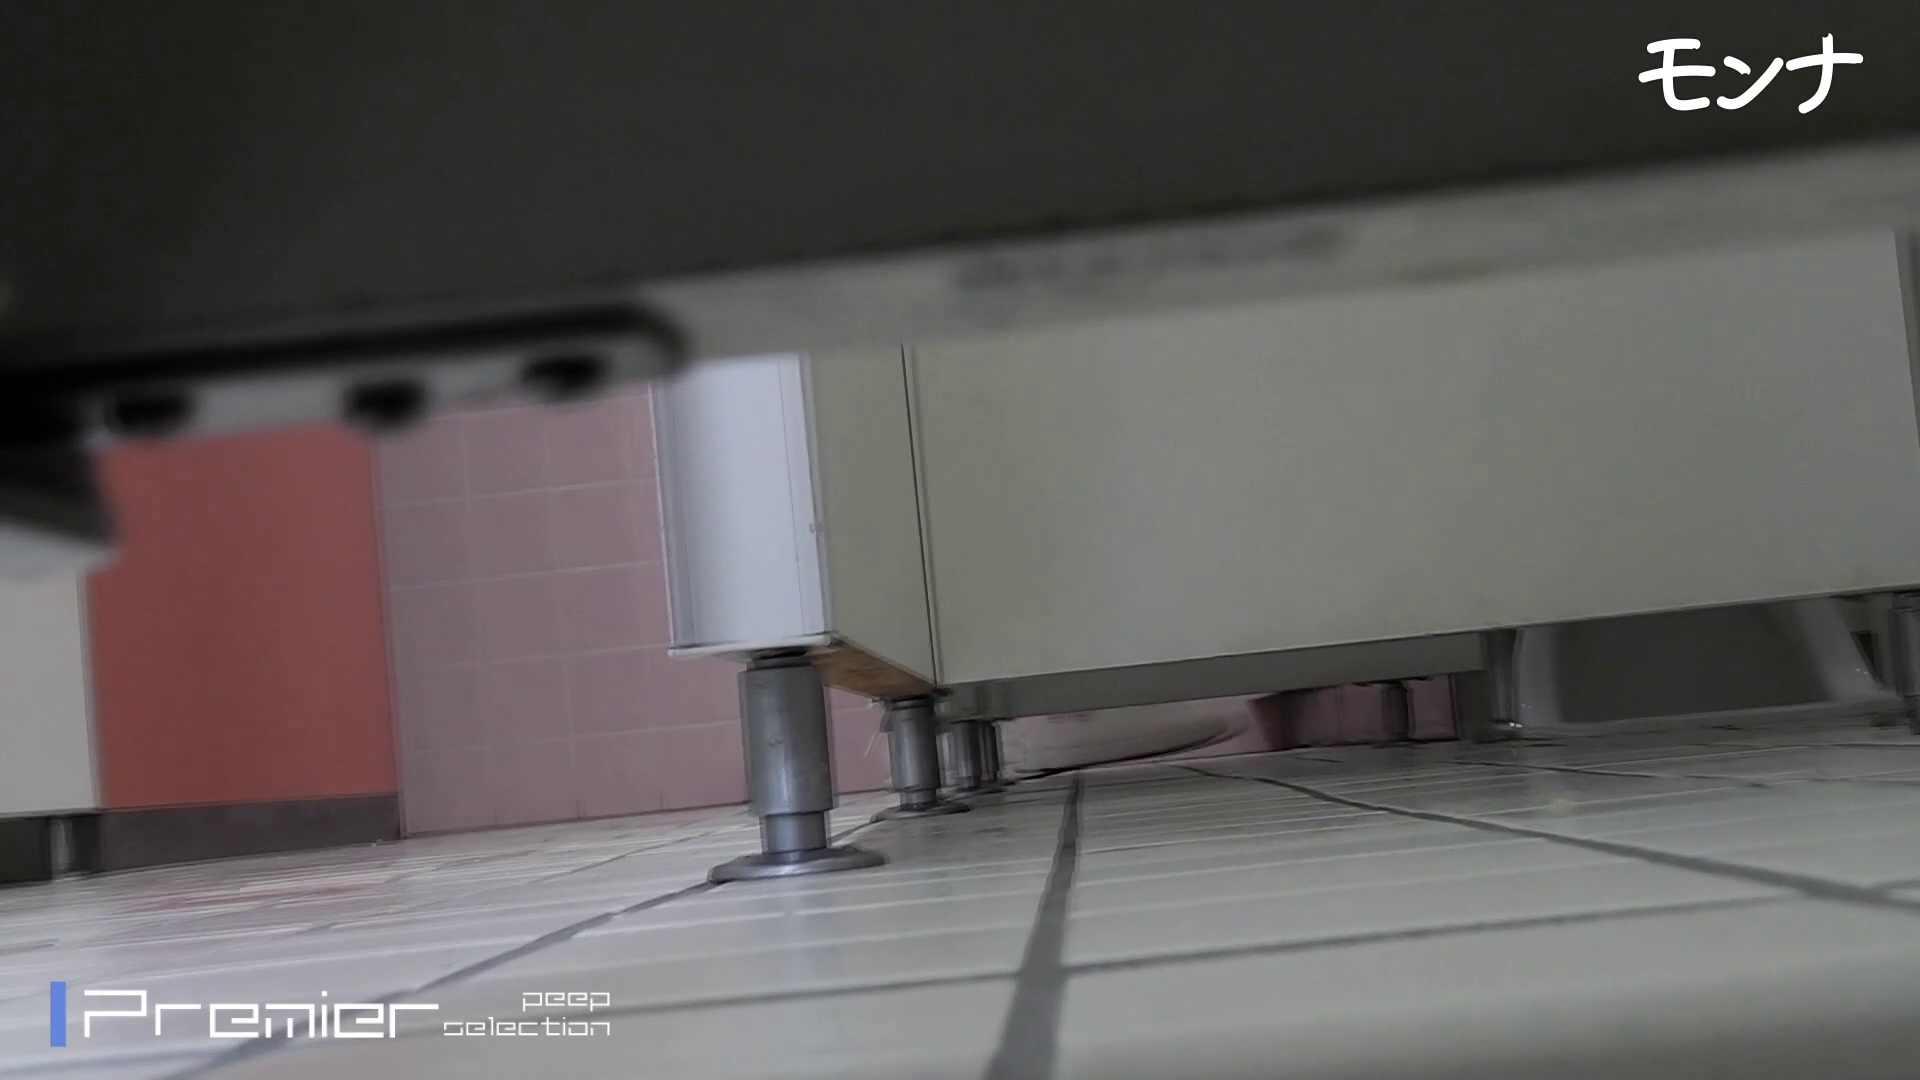 CM 悶絶シリーズ5 【美しい日本の未来 No.128】 ギャル攻め おめこ無修正動画無料 58画像 42